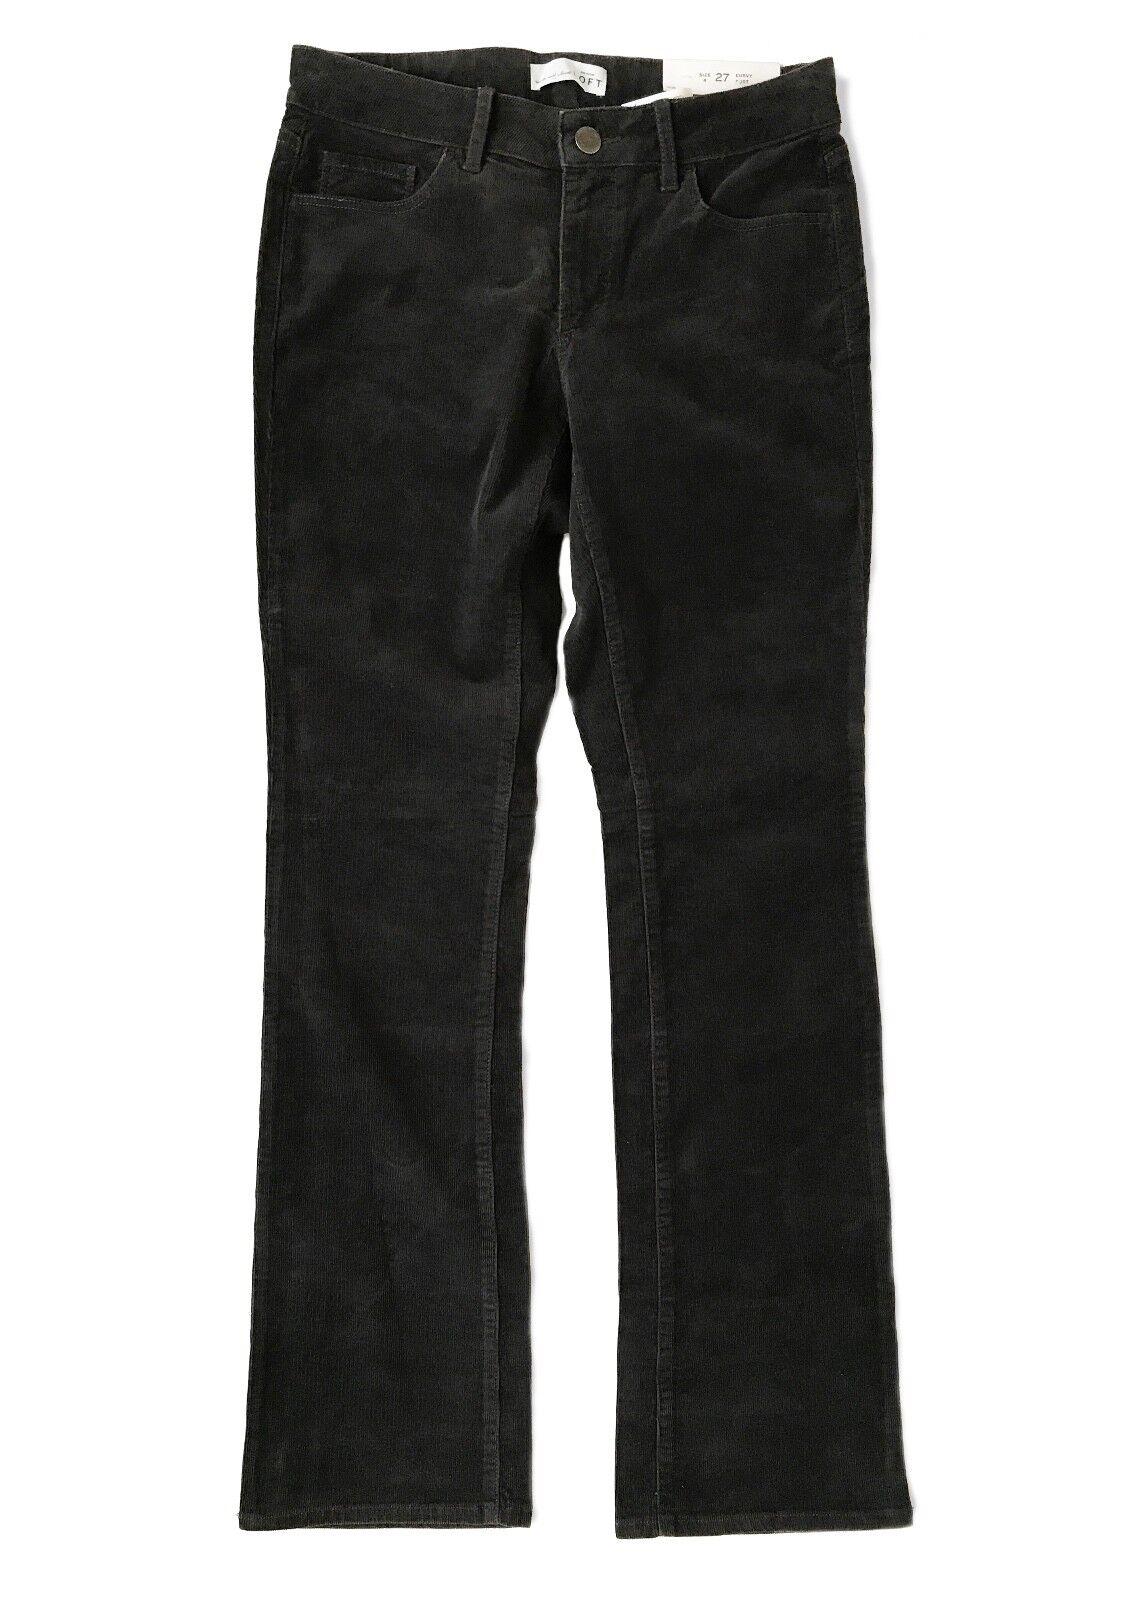 Loft - Damen 0 Hoch (0T) - Nwt - Kohle Grau Kurvige Stiefelcut Cord Hose